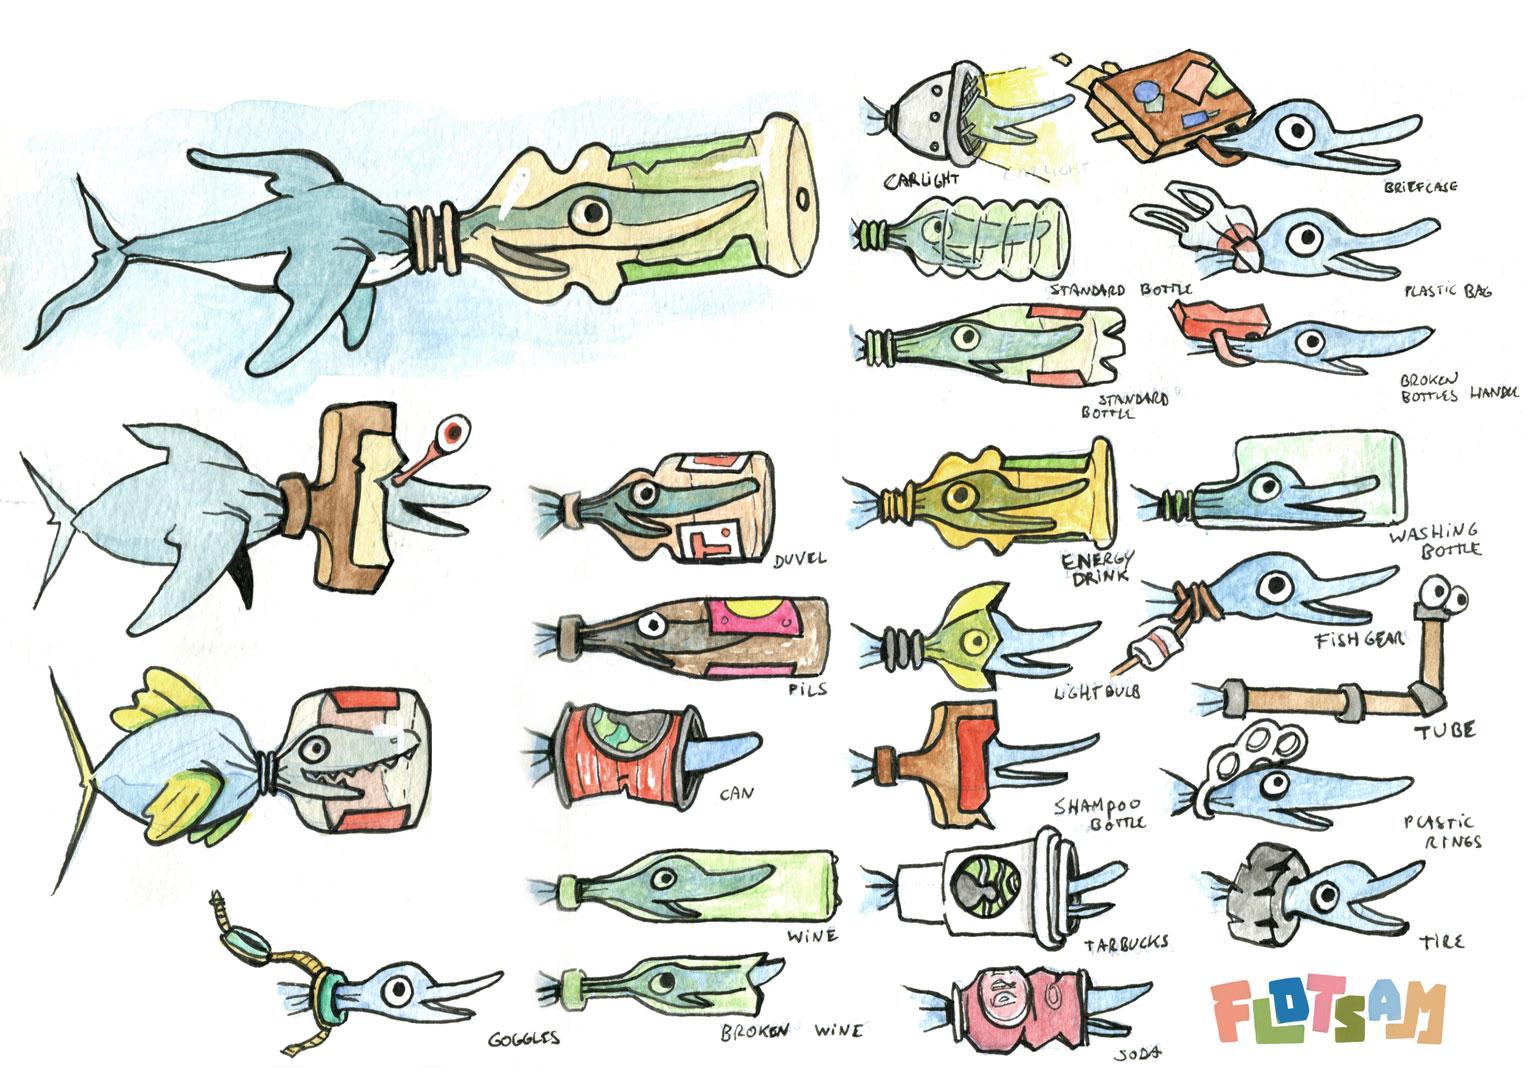 Flotsam game friendly fish concept 2